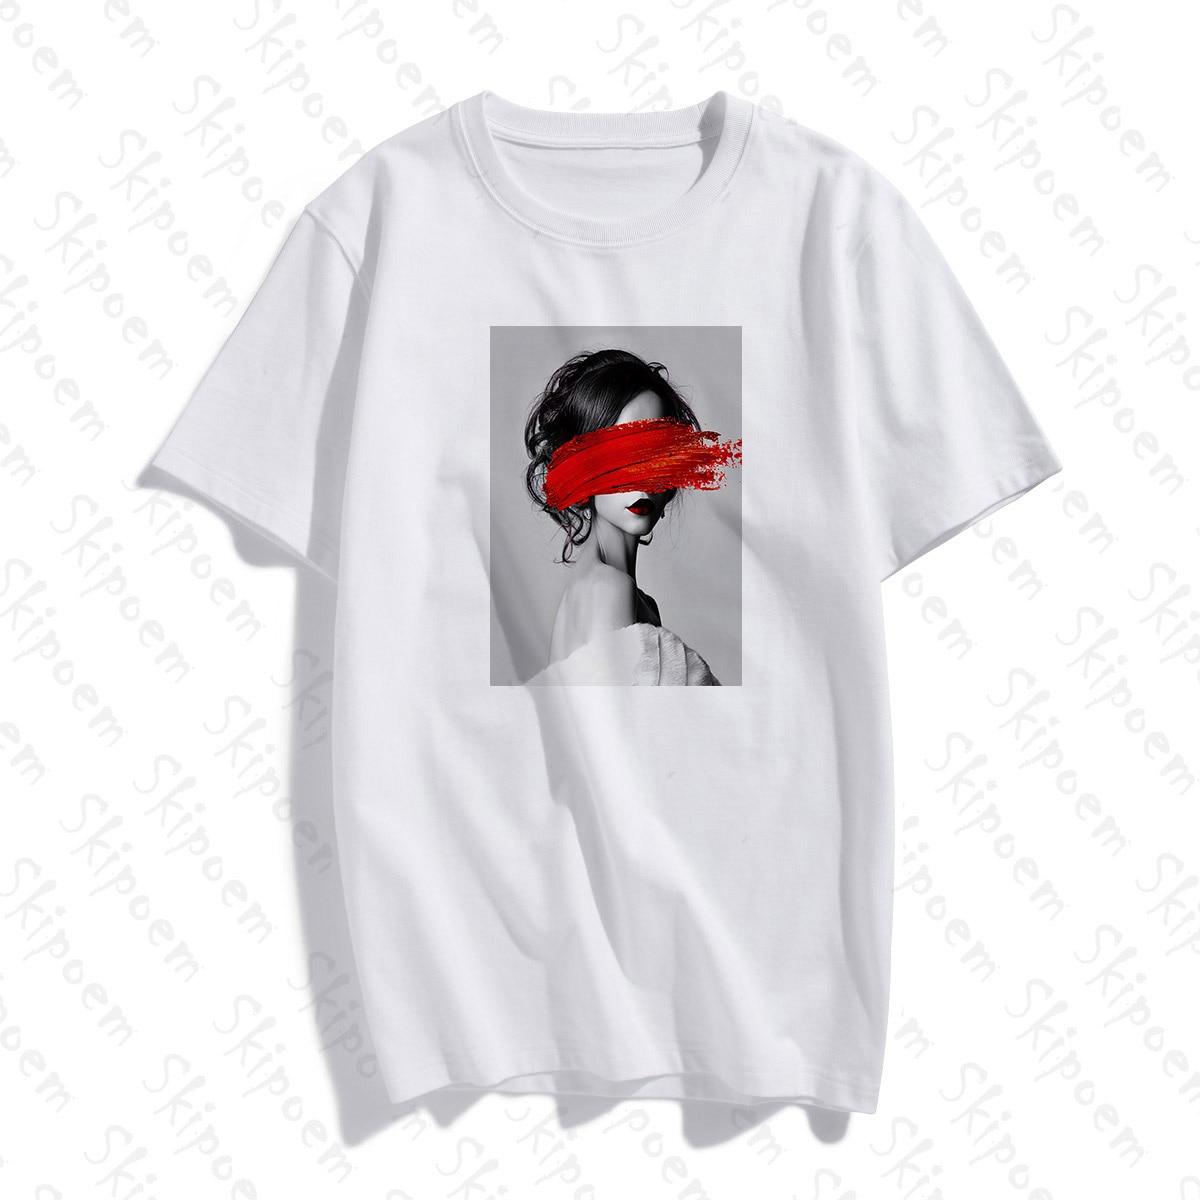 Fashion Lovely Personality Woman Nordic Vintage Art T Shirt Women Punk Harajuku Short Sleeve Cotton Plus Size Streetwear Clothes